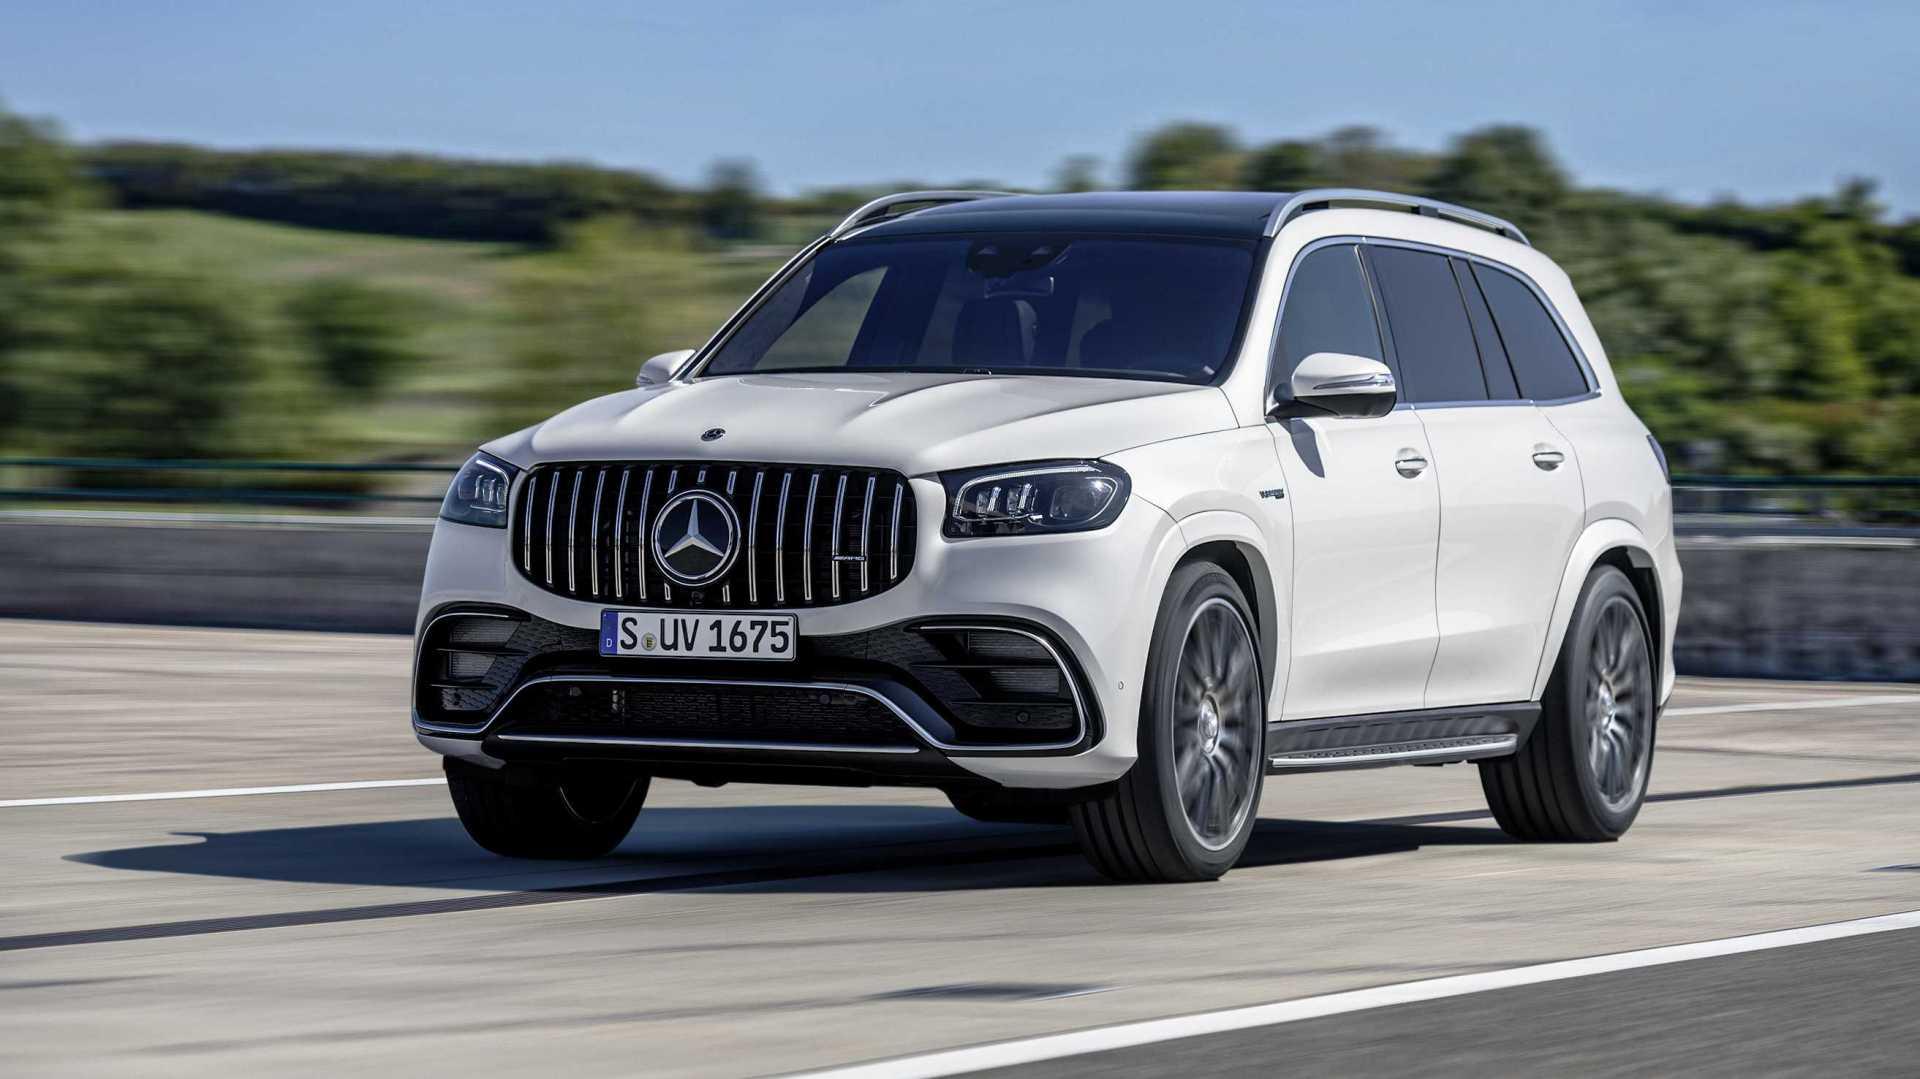 Spațiu la superlativ: acesta este noul Mercedes-Benz GLS 63 4MATIC+